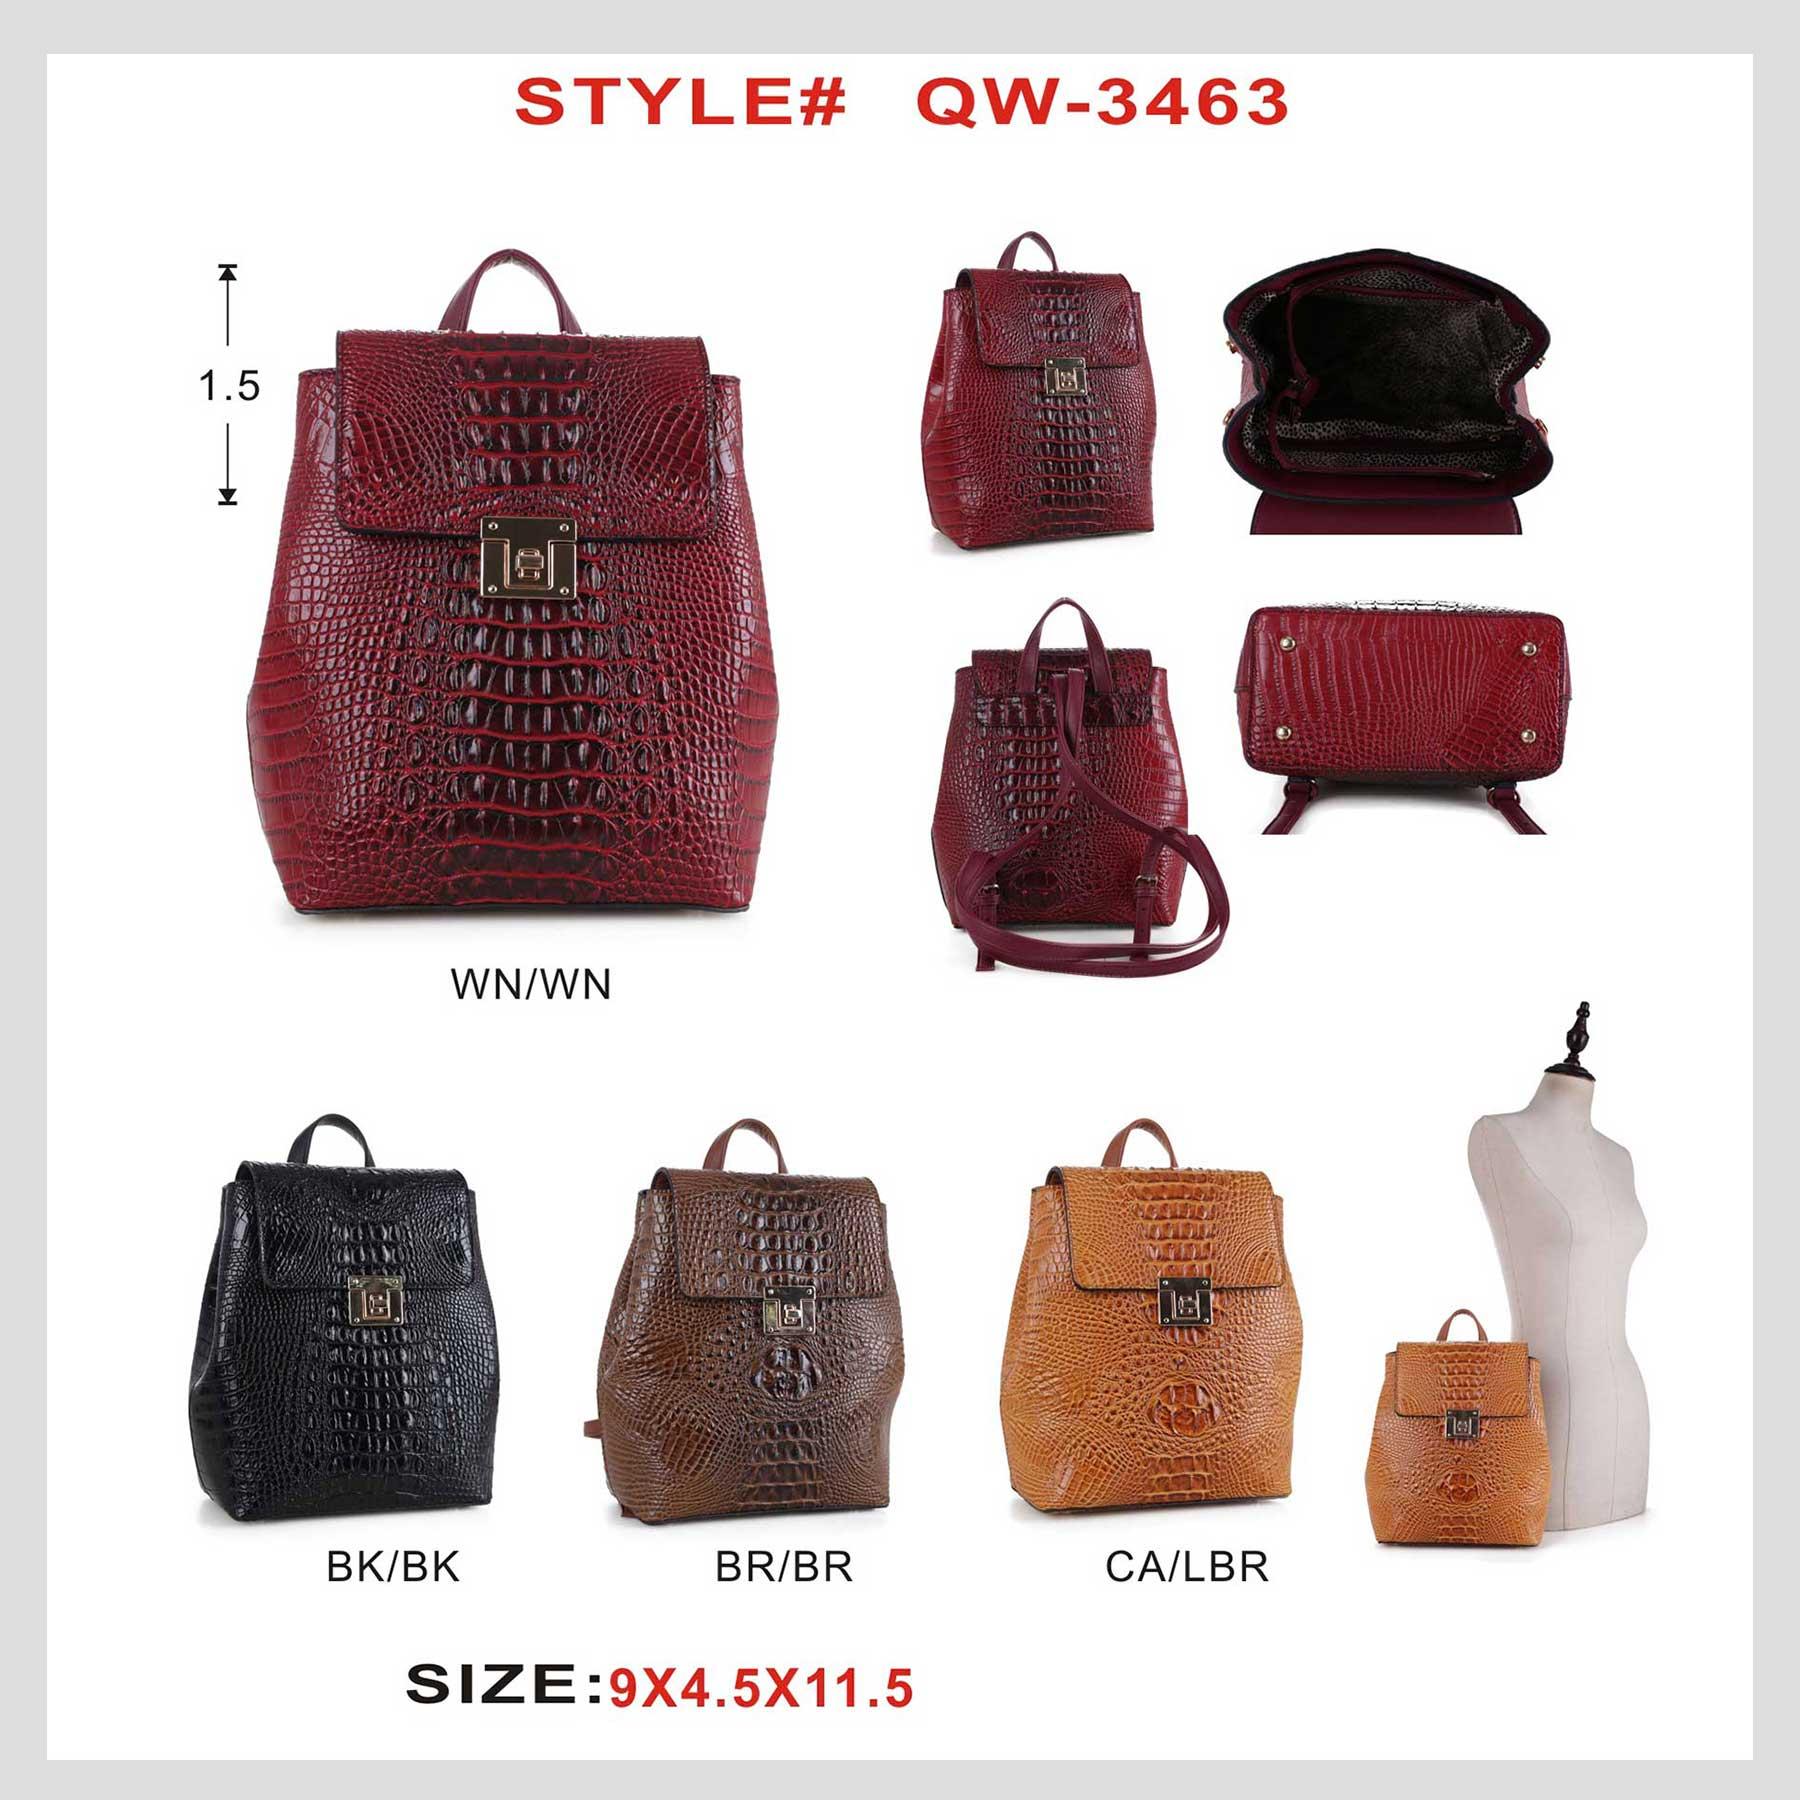 QW-3463.jpg